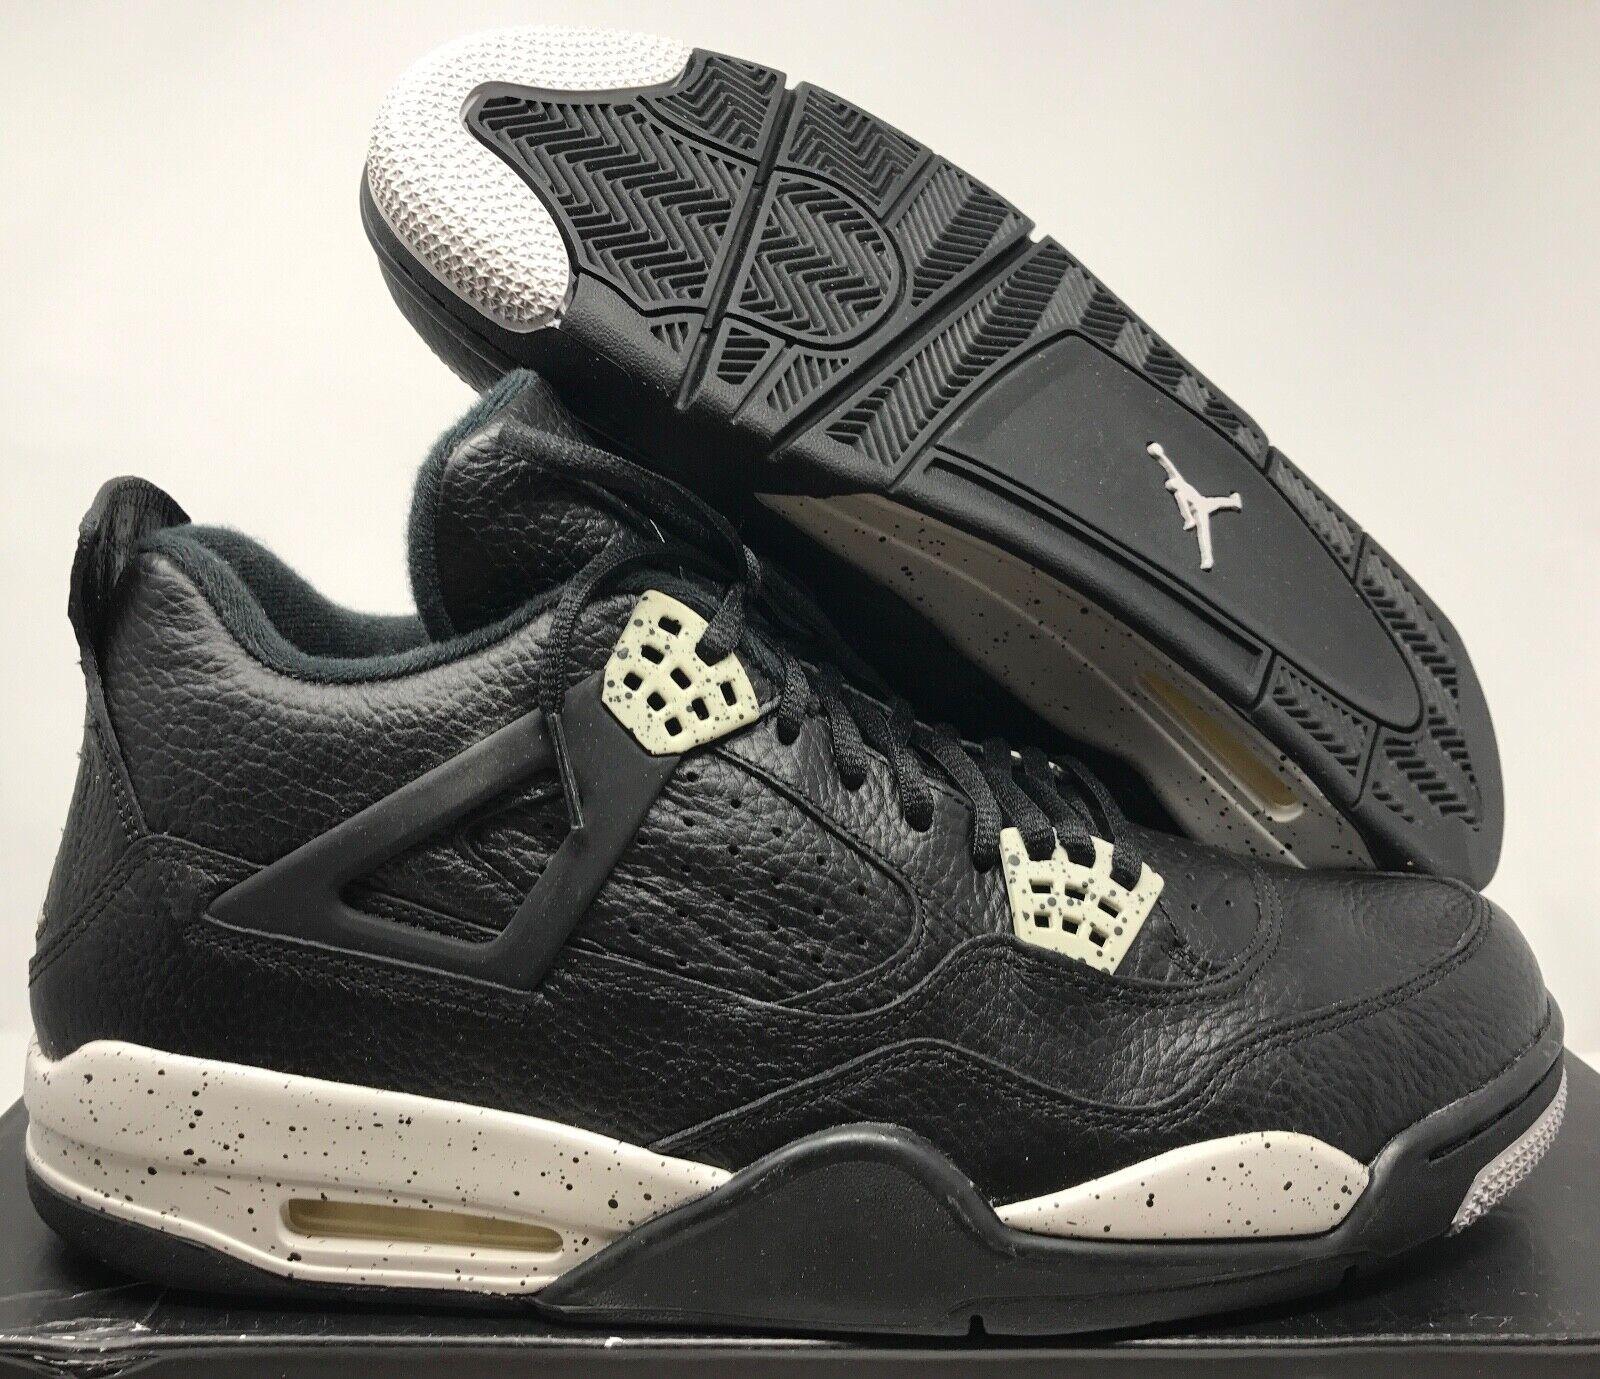 best loved 0efad ca06d Nike Air Jordan Retro IV 4 Oreo Size 11 DS With Receipt 100 Legit